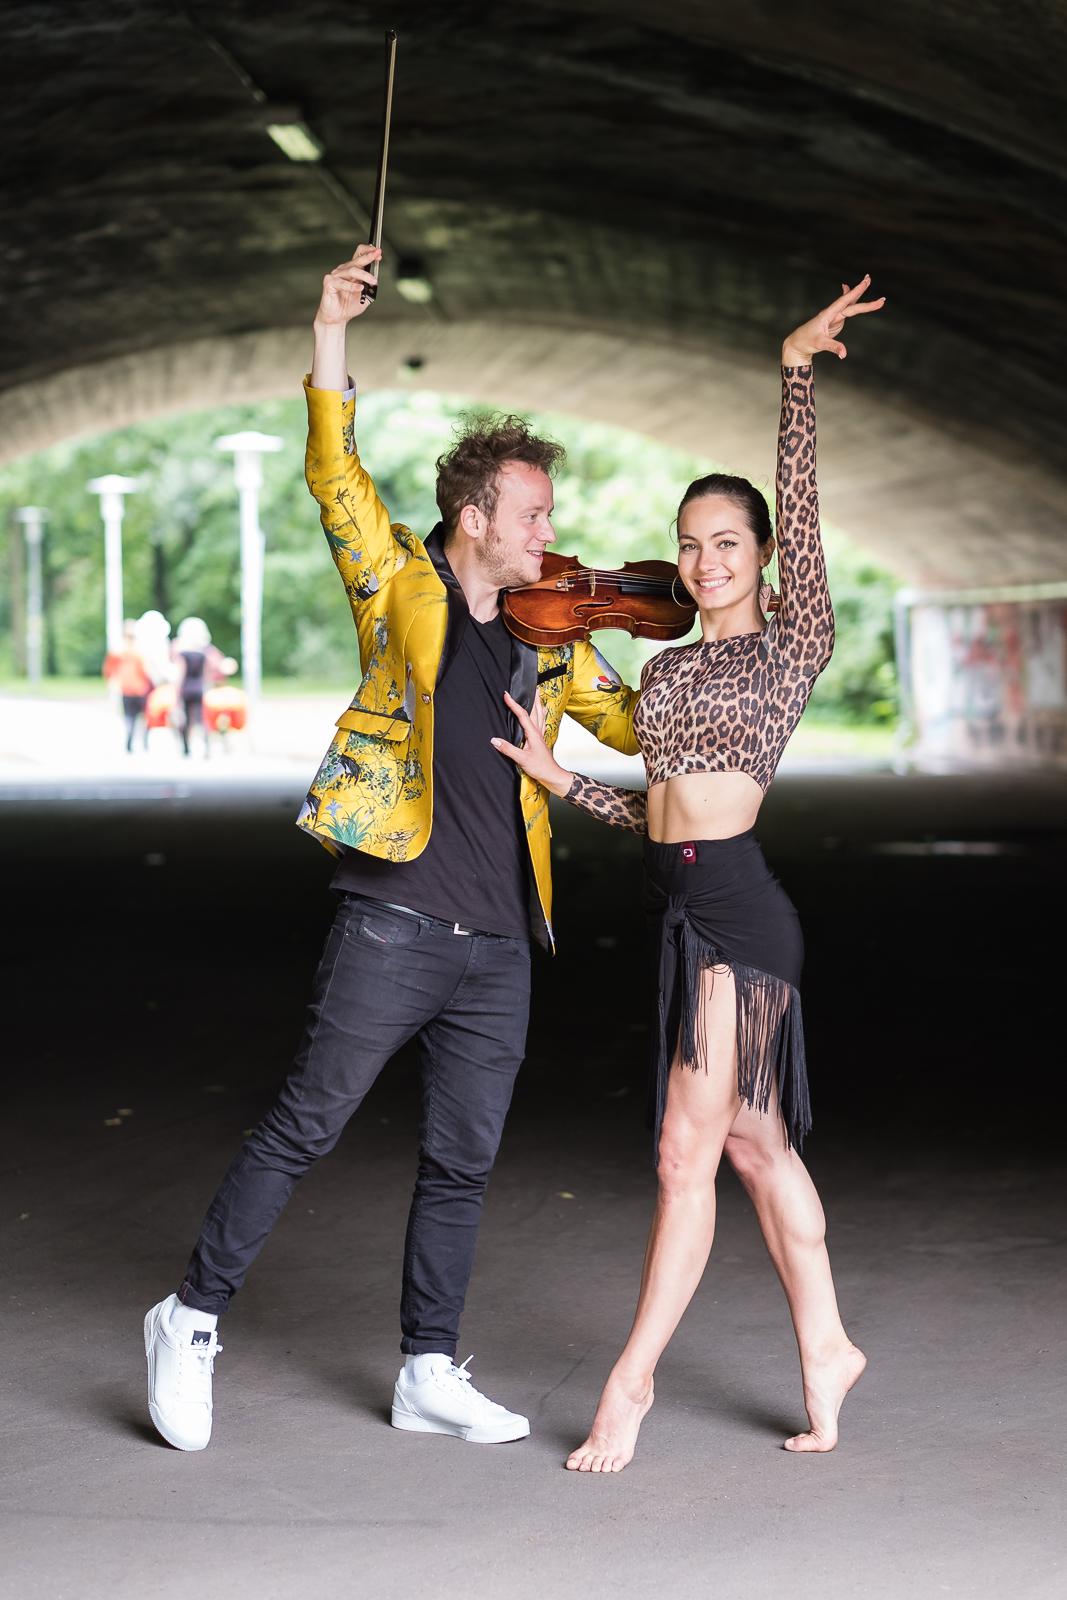 Available Light Künstler Porträt Max Eisinger Diana Starnets Latin American Dance Violine Wöhrder Wiese Nürnberg Fotograf Jürgen Klieber